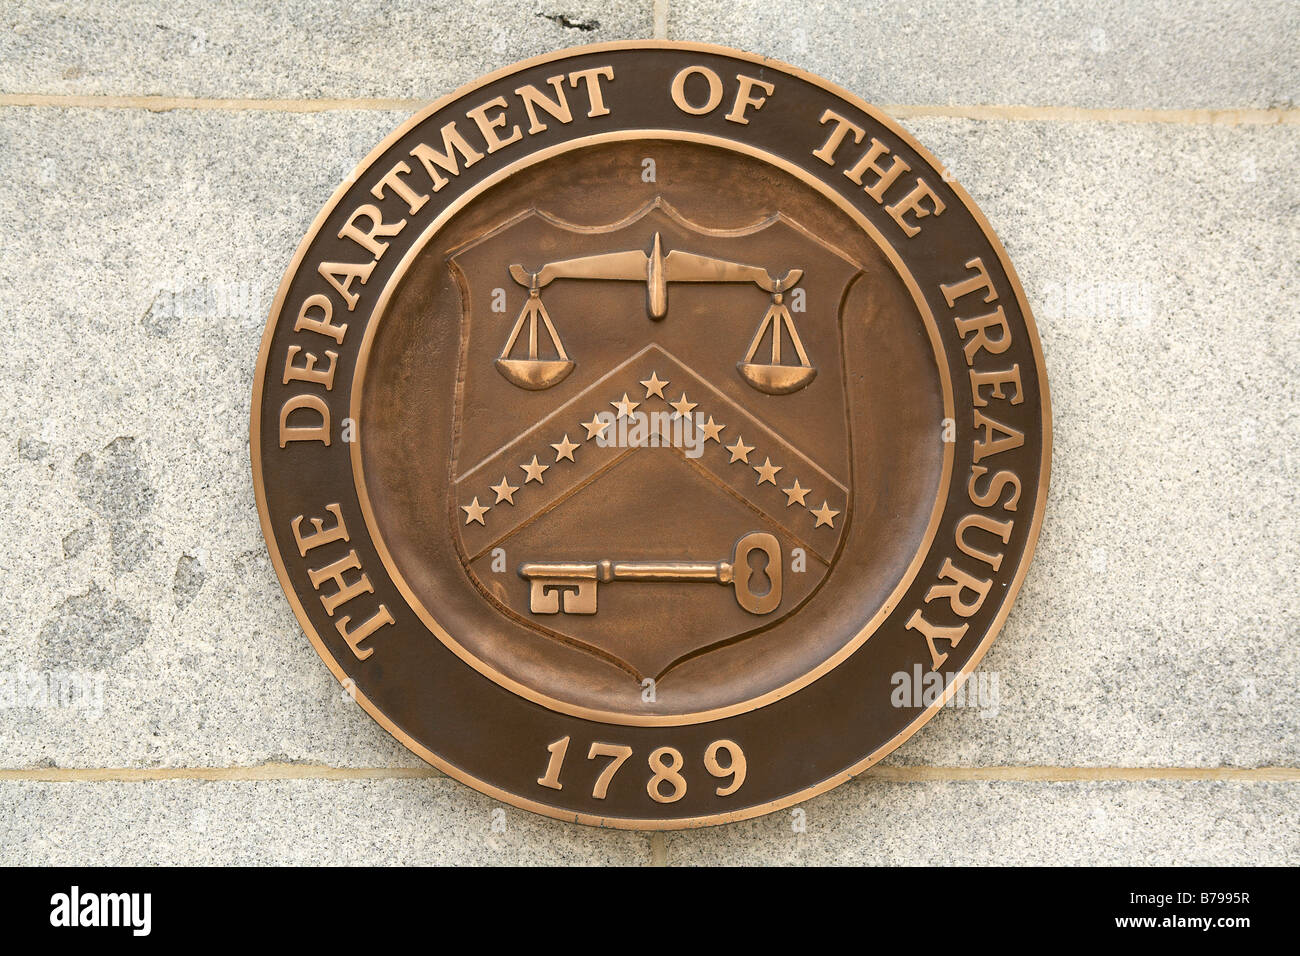 U.S. Department of the Treasury Seal Washington DC - Stock Image